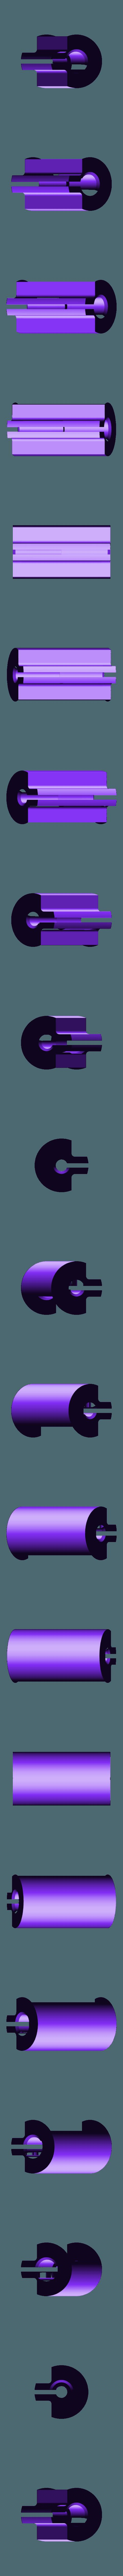 motor_koppeling.stl Download free STL file FDM Printer de Kleine Reus 300x300x900 • 3D printable object, Job